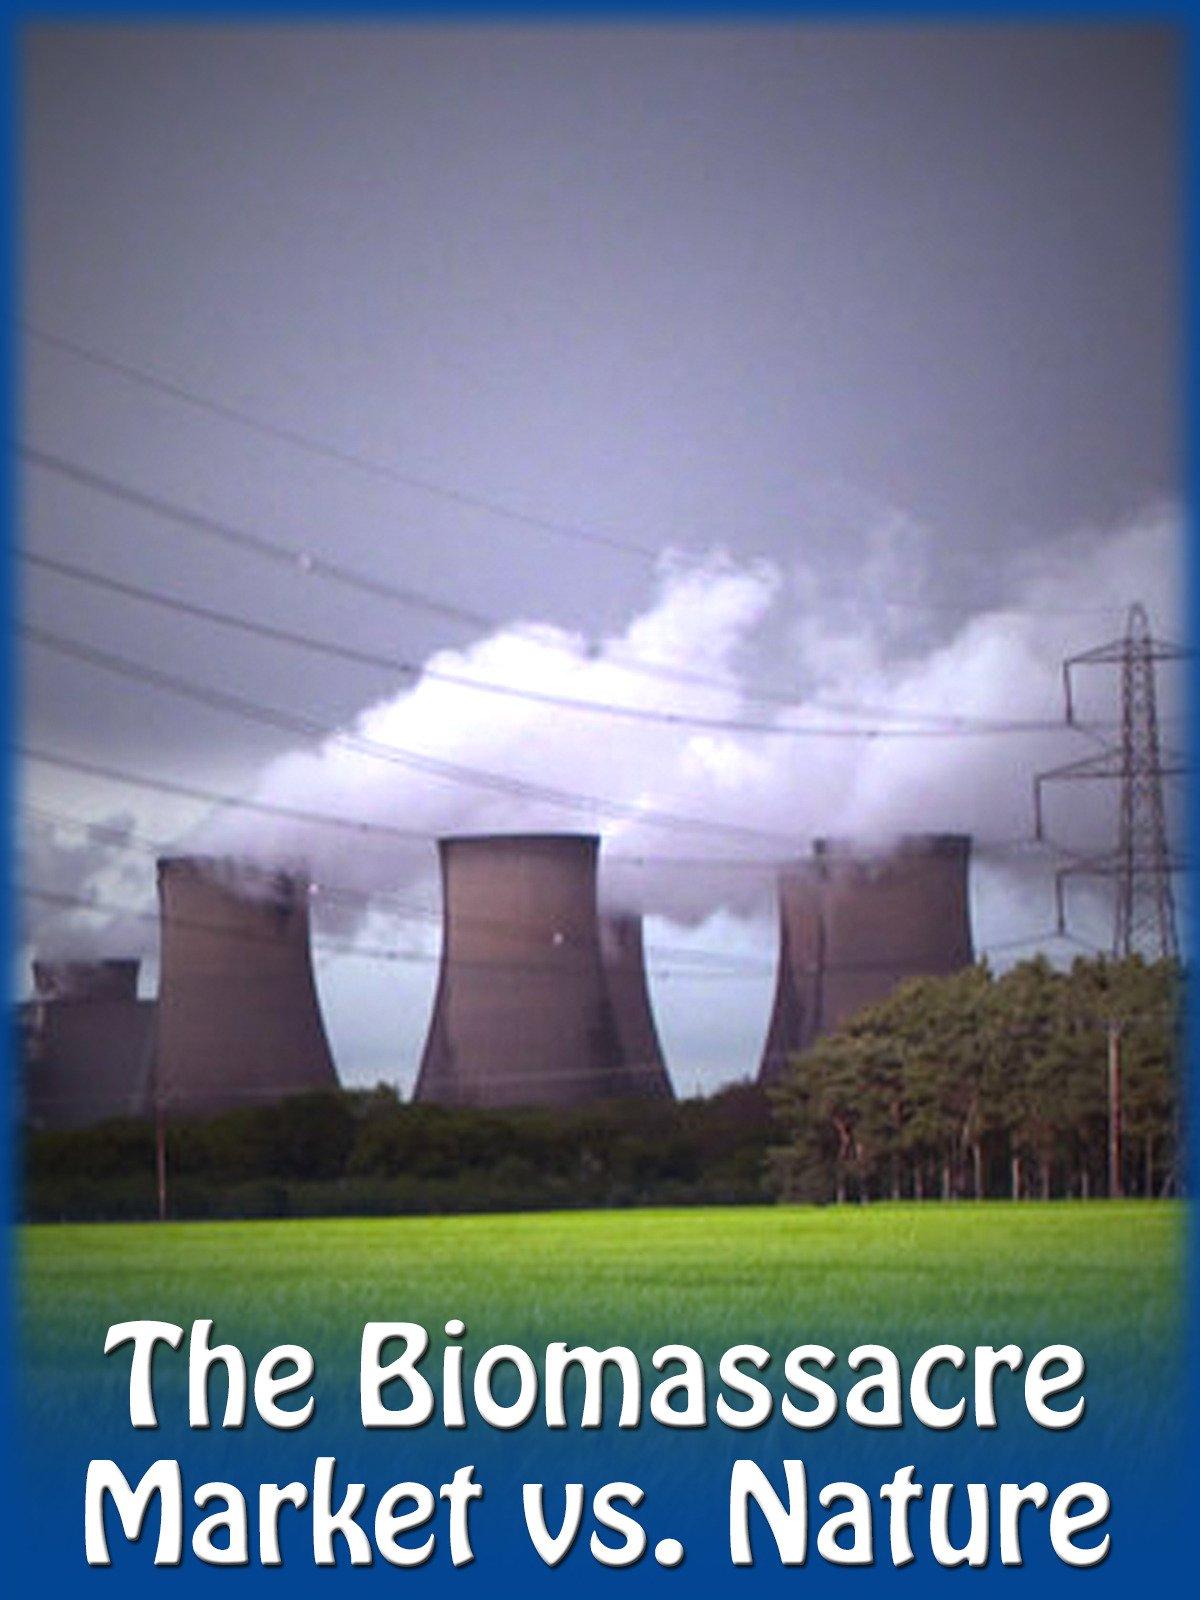 The Biomassacre - Market vs. Nature